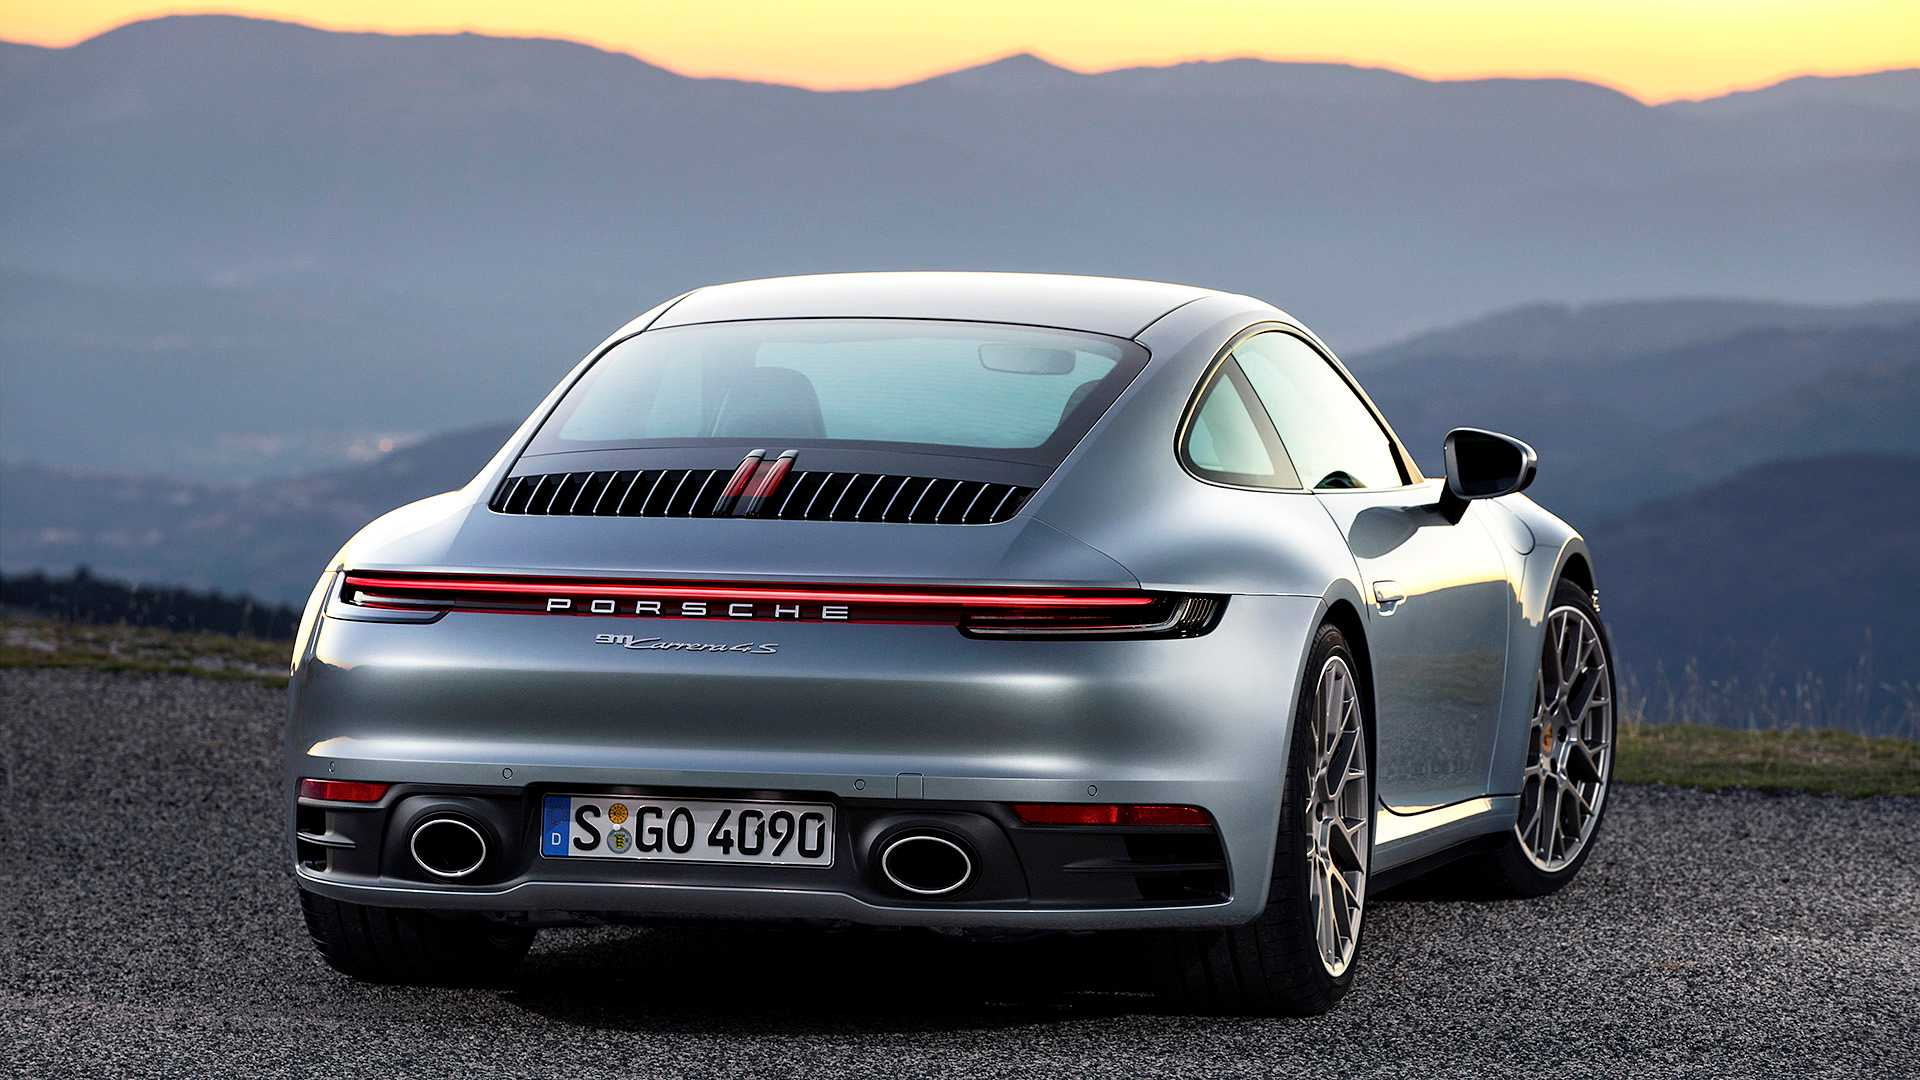 2019-Porsche-911-Carrera-4S-992_2